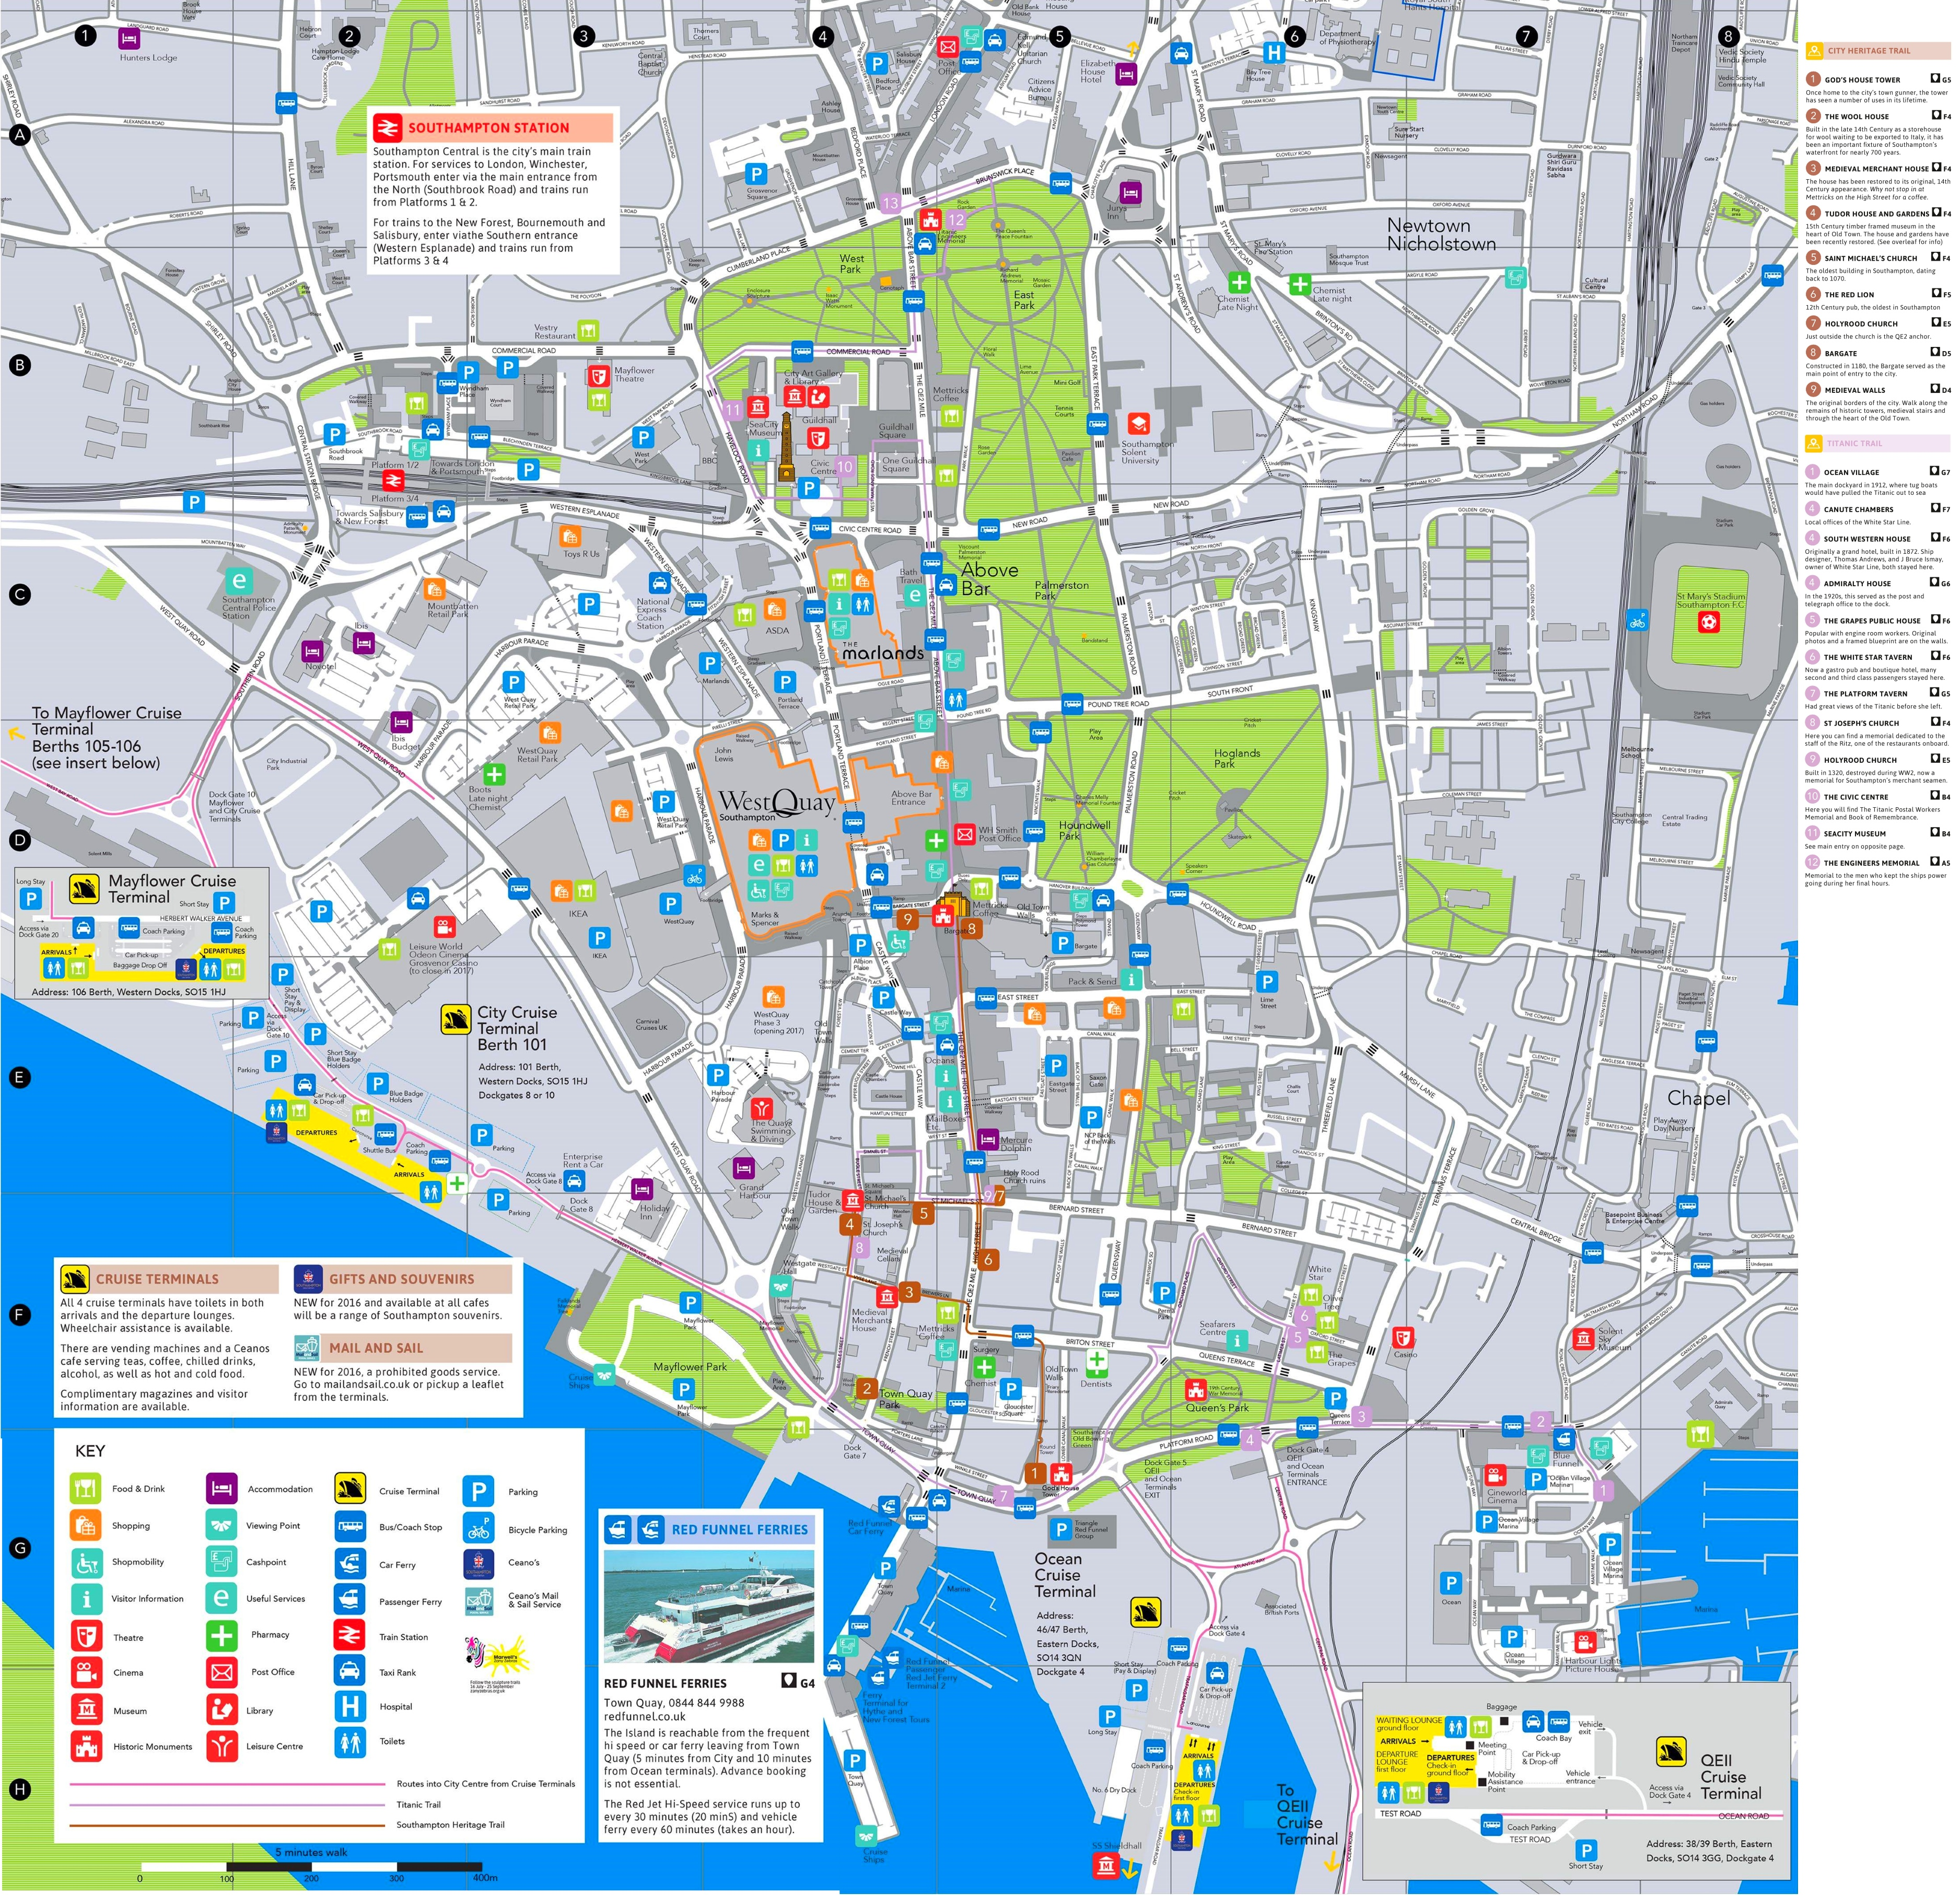 Map Of Southampton Southampton tourist map Map Of Southampton